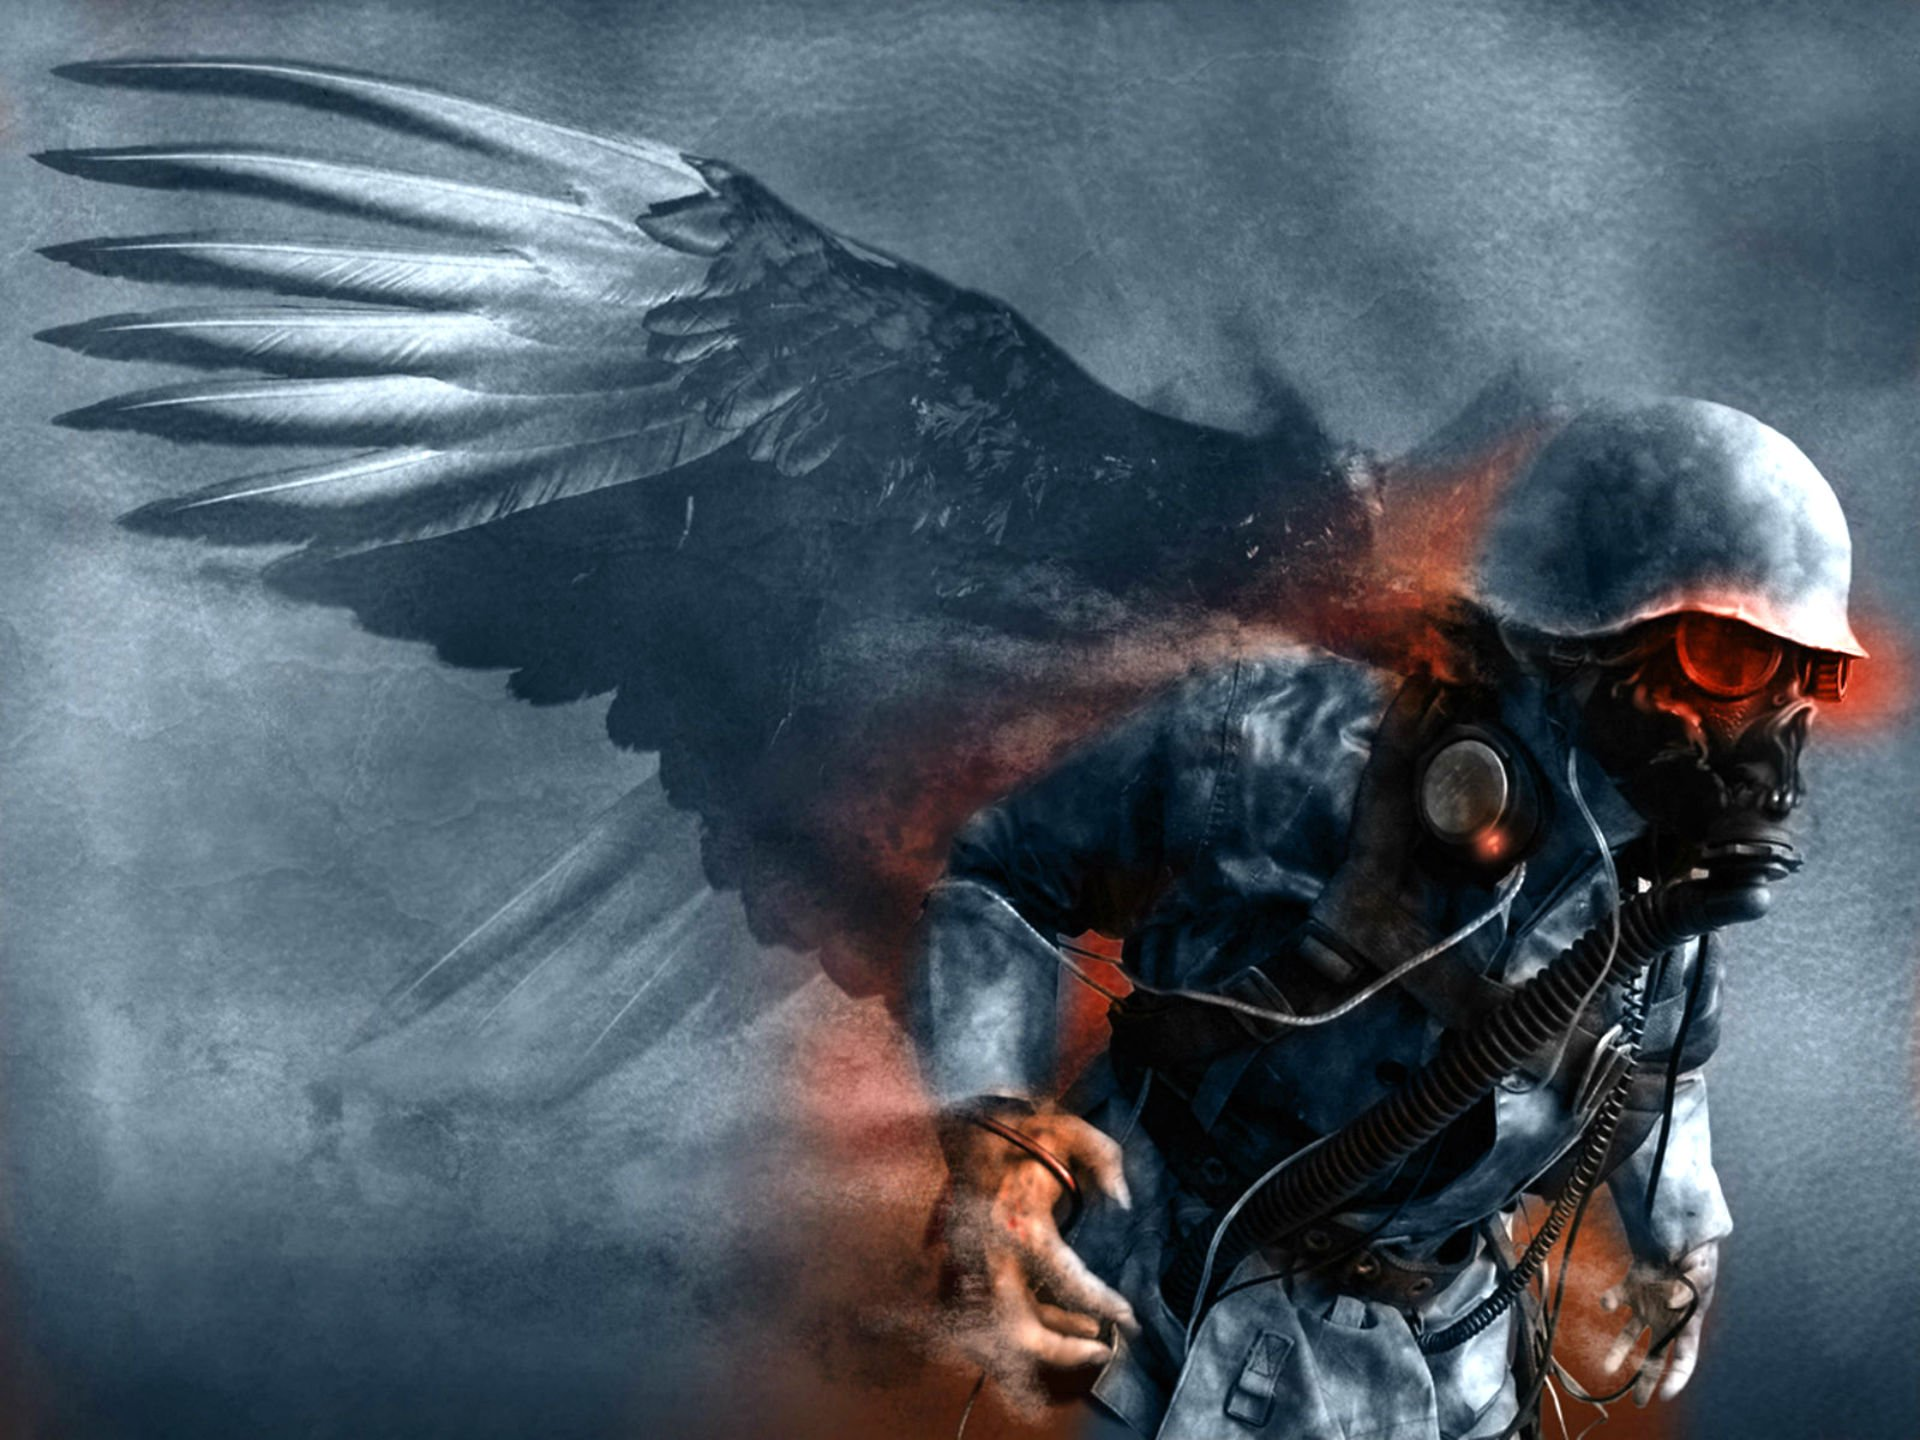 metro survival horror shooter sci-fi apocalyptic dark 2033 last